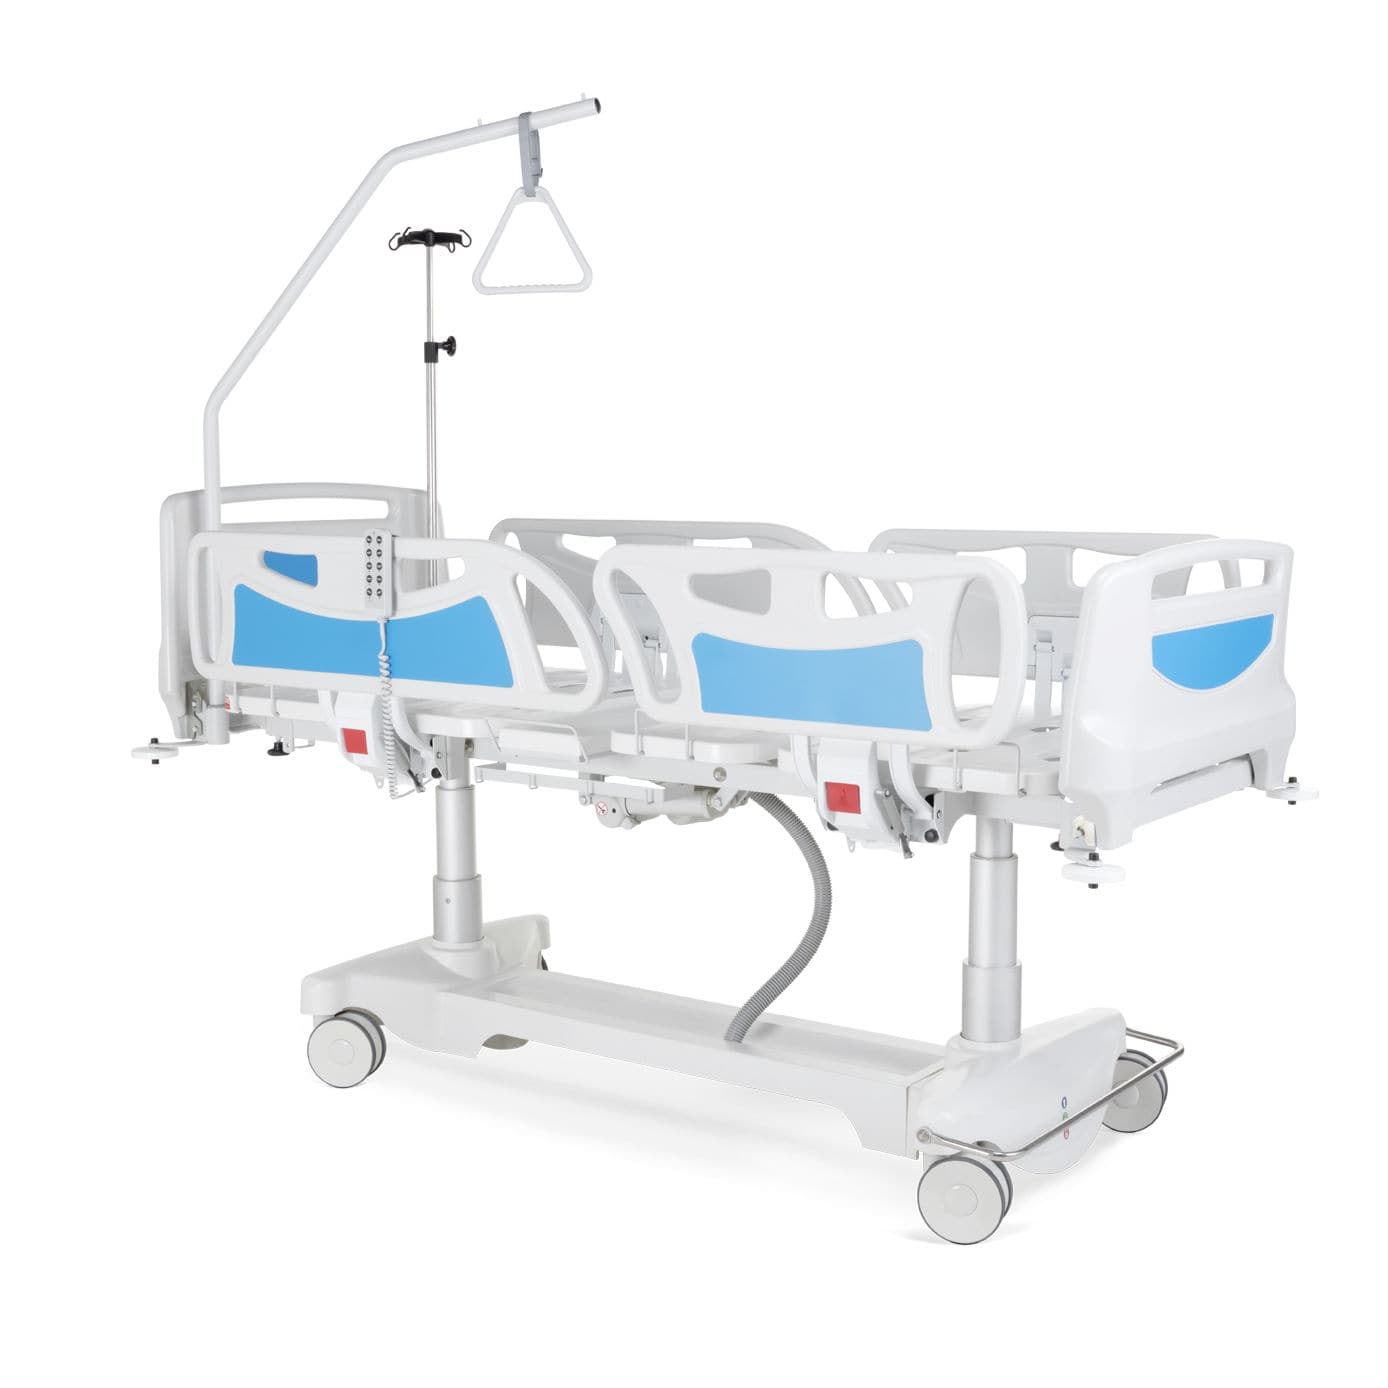 Full Size of Krankenhausbett Elektrisch Hhenverstellbar Mit Bett Weiß 100x200 Massiv 180x200 140x200 Stauraum 2x2m Eiche Podest Betten Mannheim 160x200 Komplett Matratze Bett Krankenhaus Bett